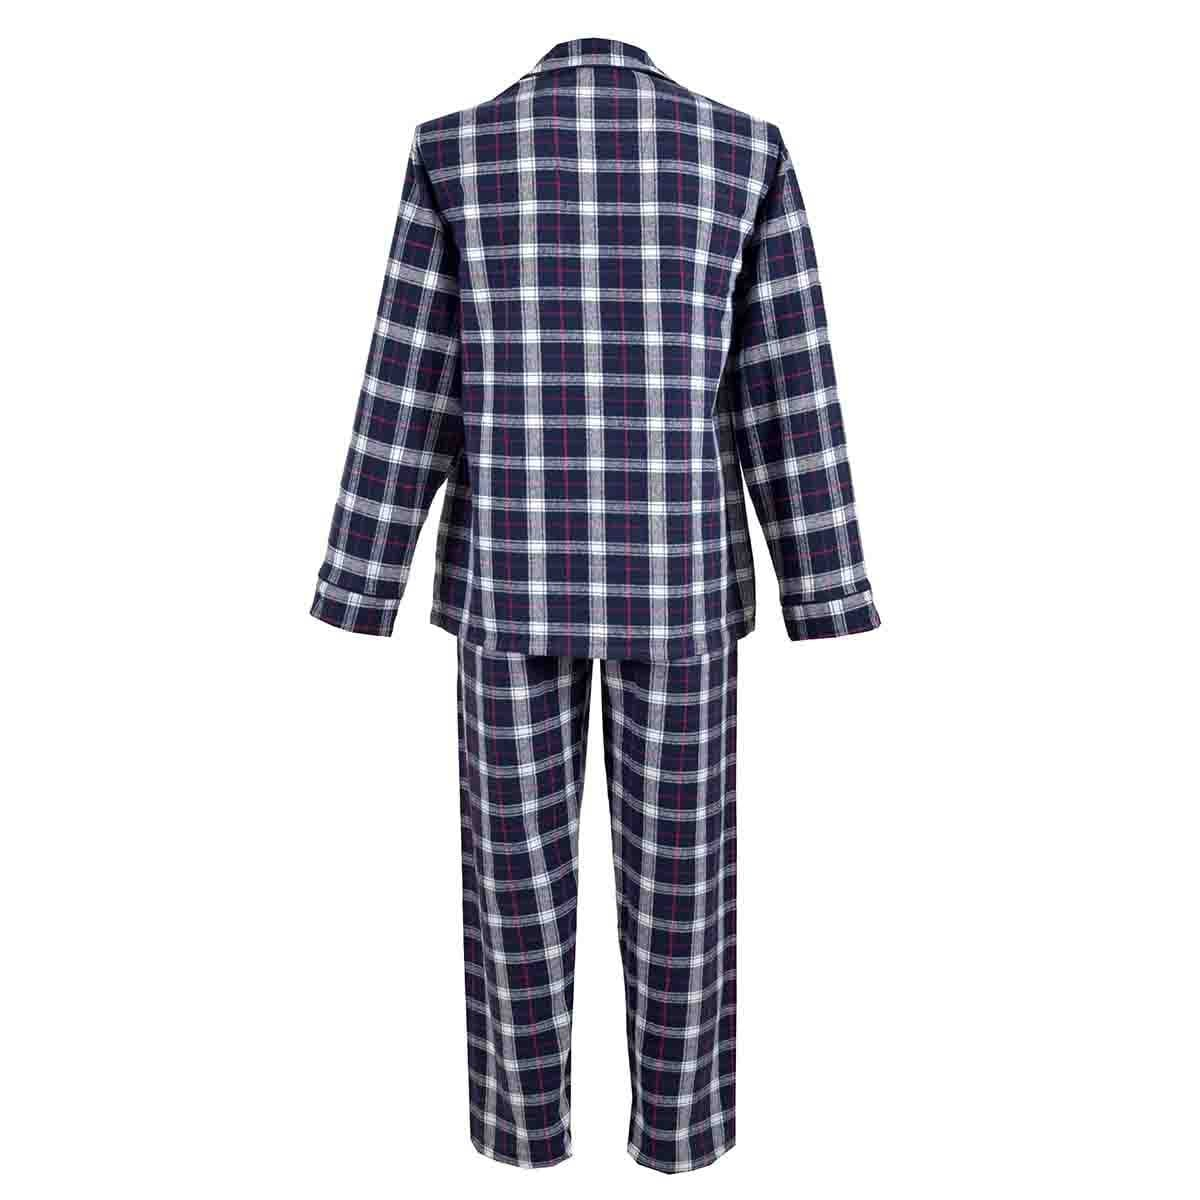 Pijama Manga Larga de Franela a Cuadros Carlo Corinto